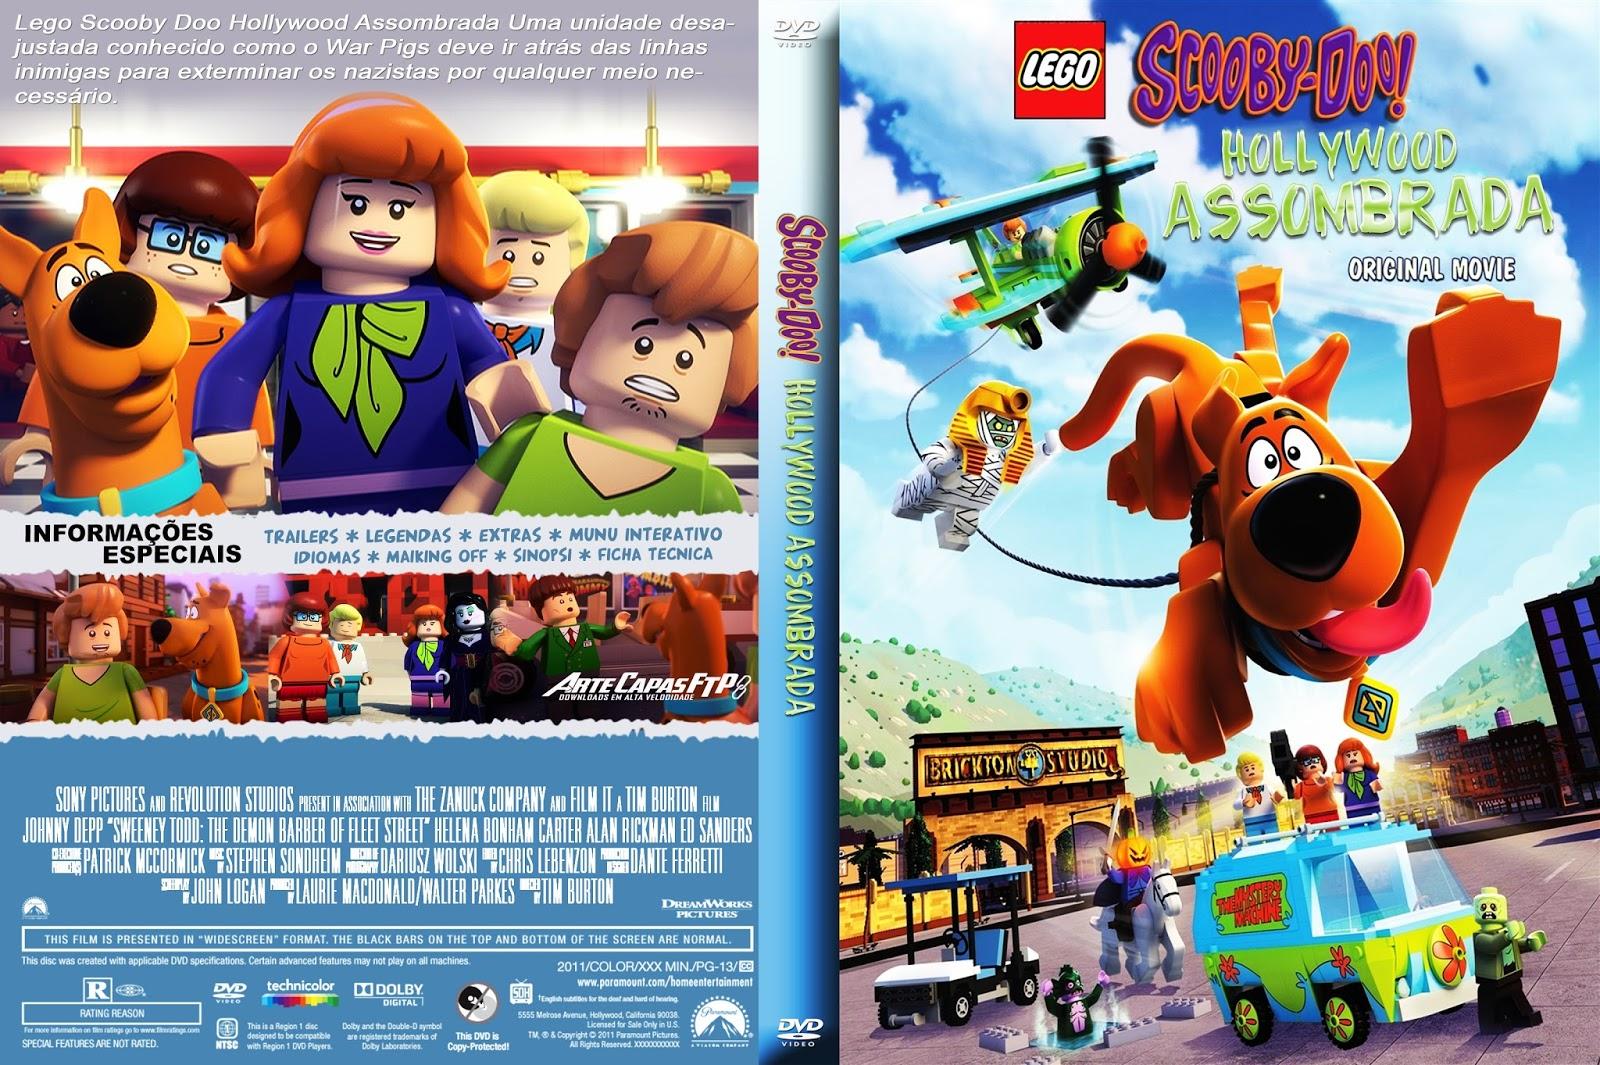 Lego Scooby-Doo Hollywood Assombrada BDRip XviD Dual Áudio Lego 2BScooby Doo 2BHollywood 2BAssombrada 2B  2BXANDAODOWNLOAD